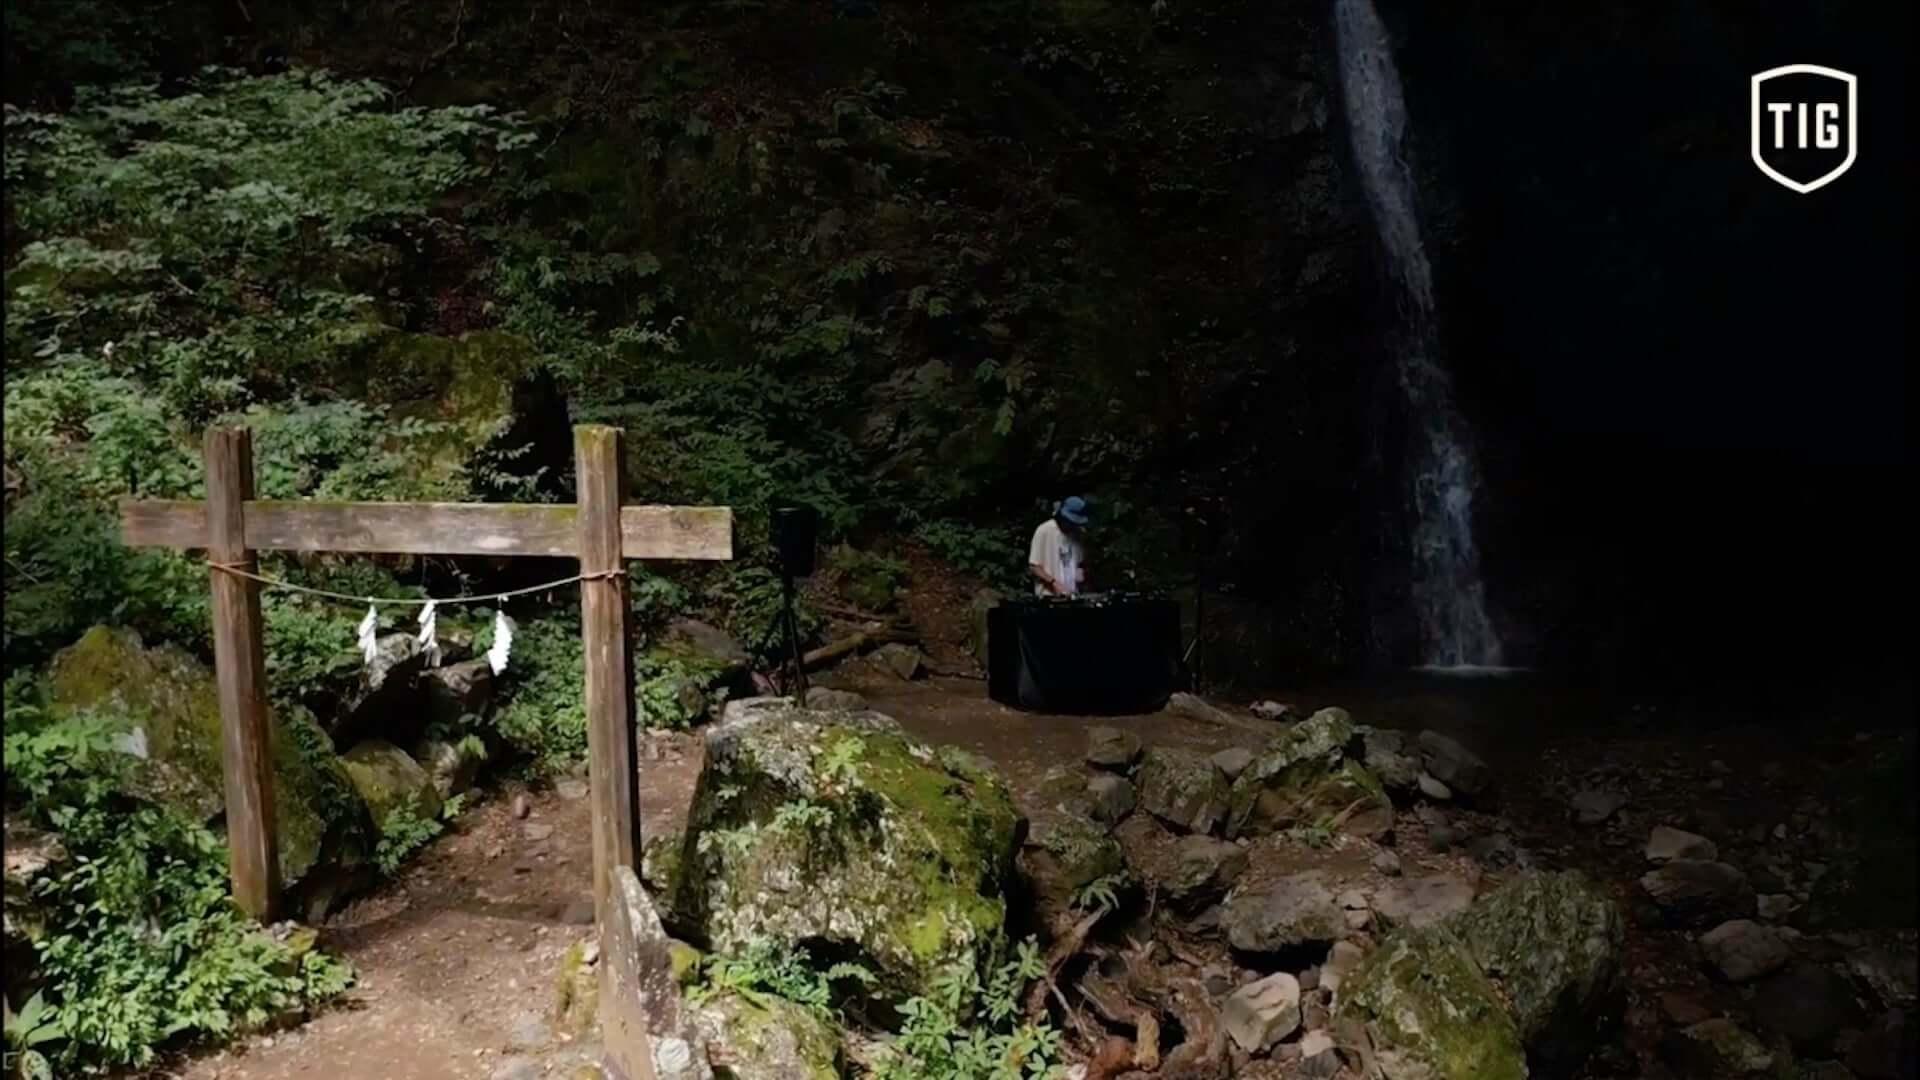 J.A.K.A.M.、Kaoru Inoue、starRoらが日本の自然遺産・文化遺産から音楽を発信!YouTubeチャンネル「THAT IS GOOD」が開設 art201014_thatisgood_6-1920x1080